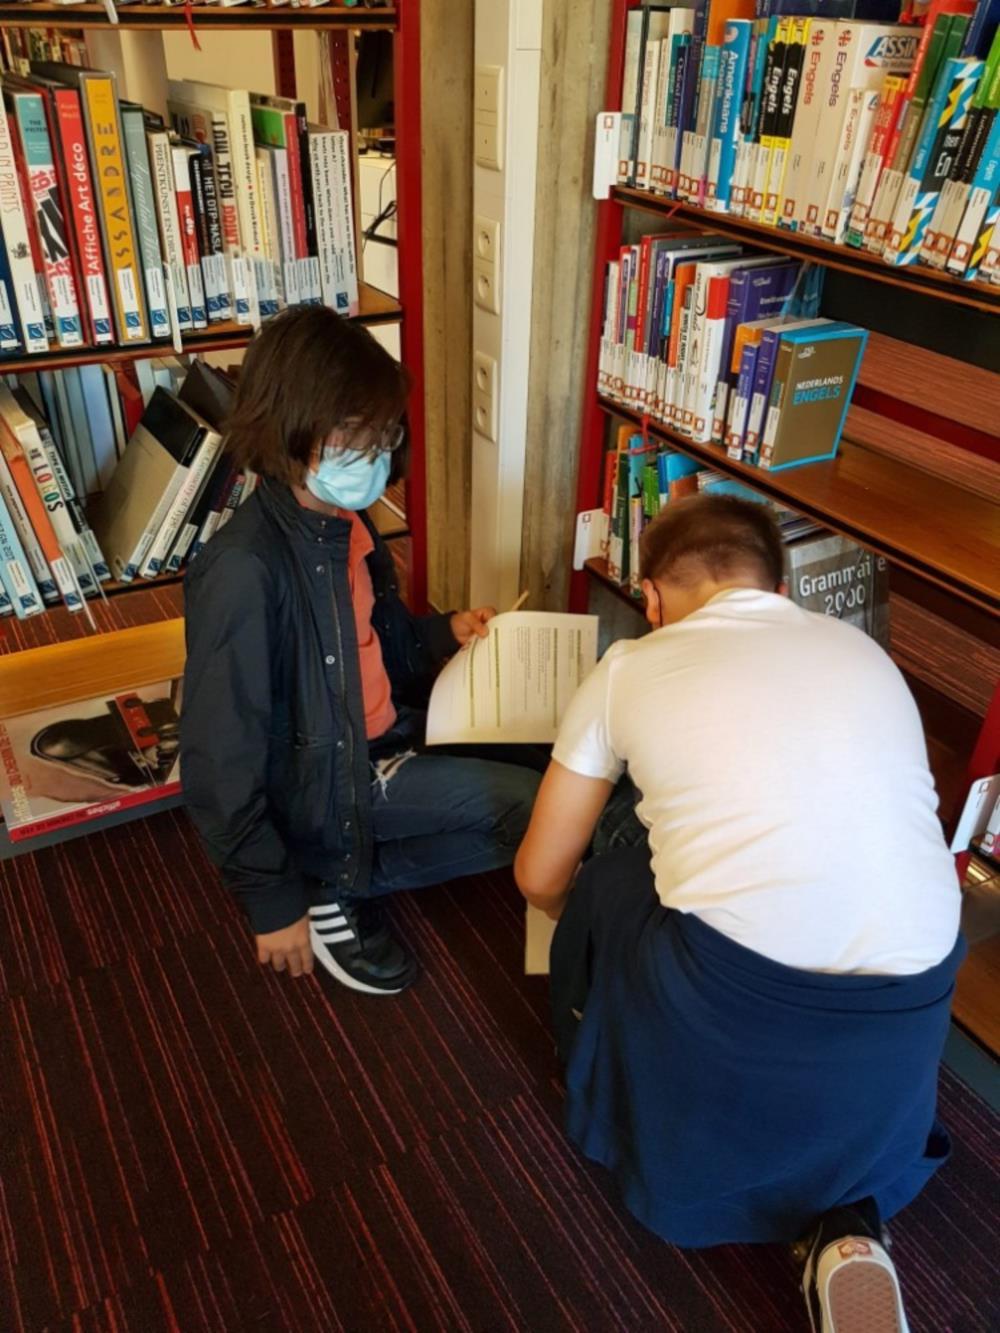 Bibliotheekbezoek